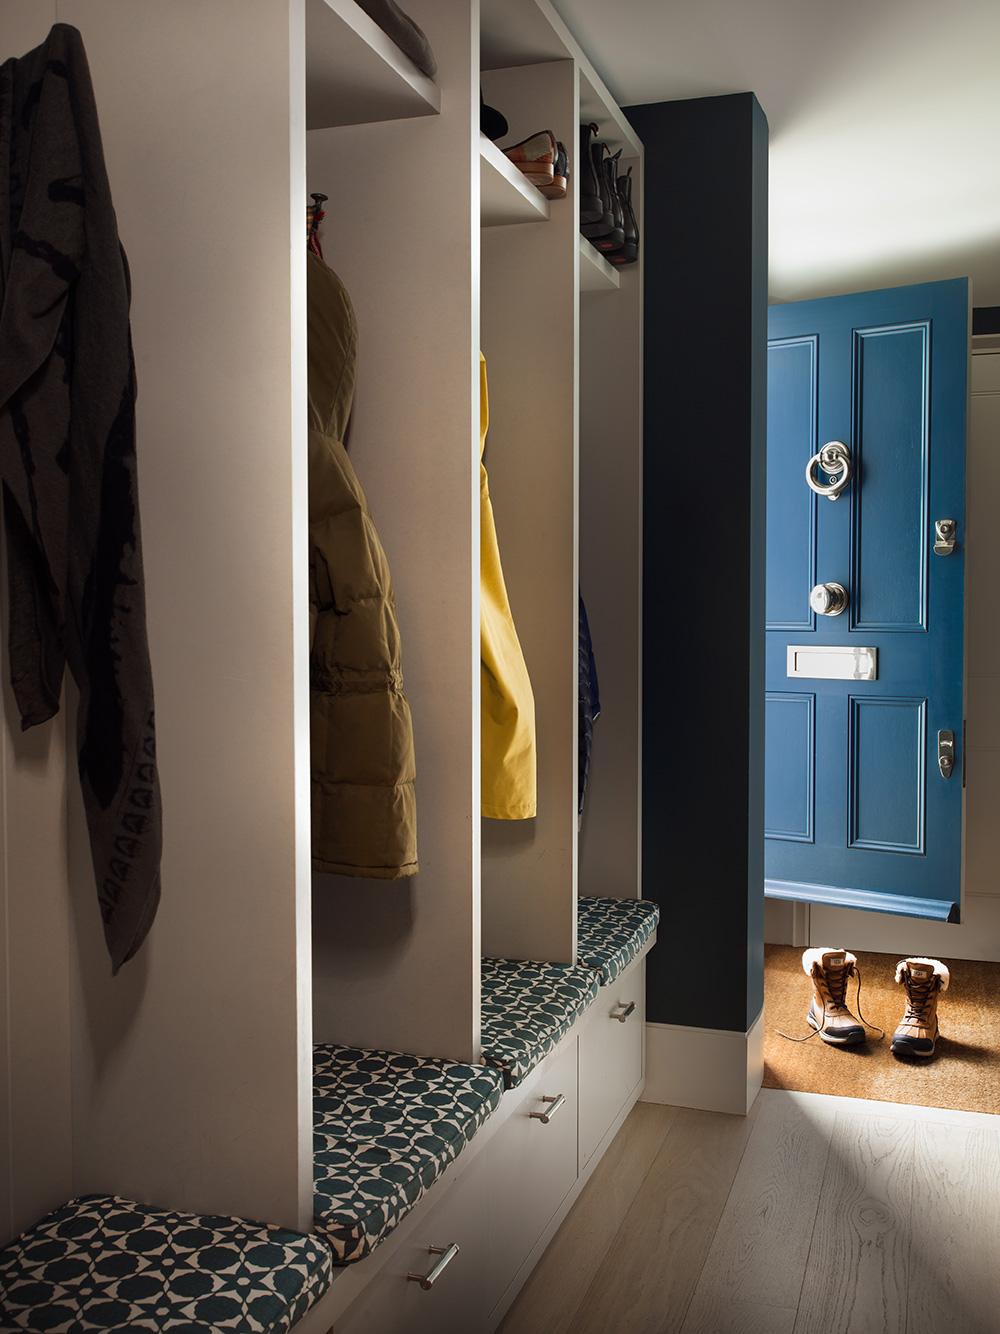 Coat cupbaord – interior design by Eadie & Crole